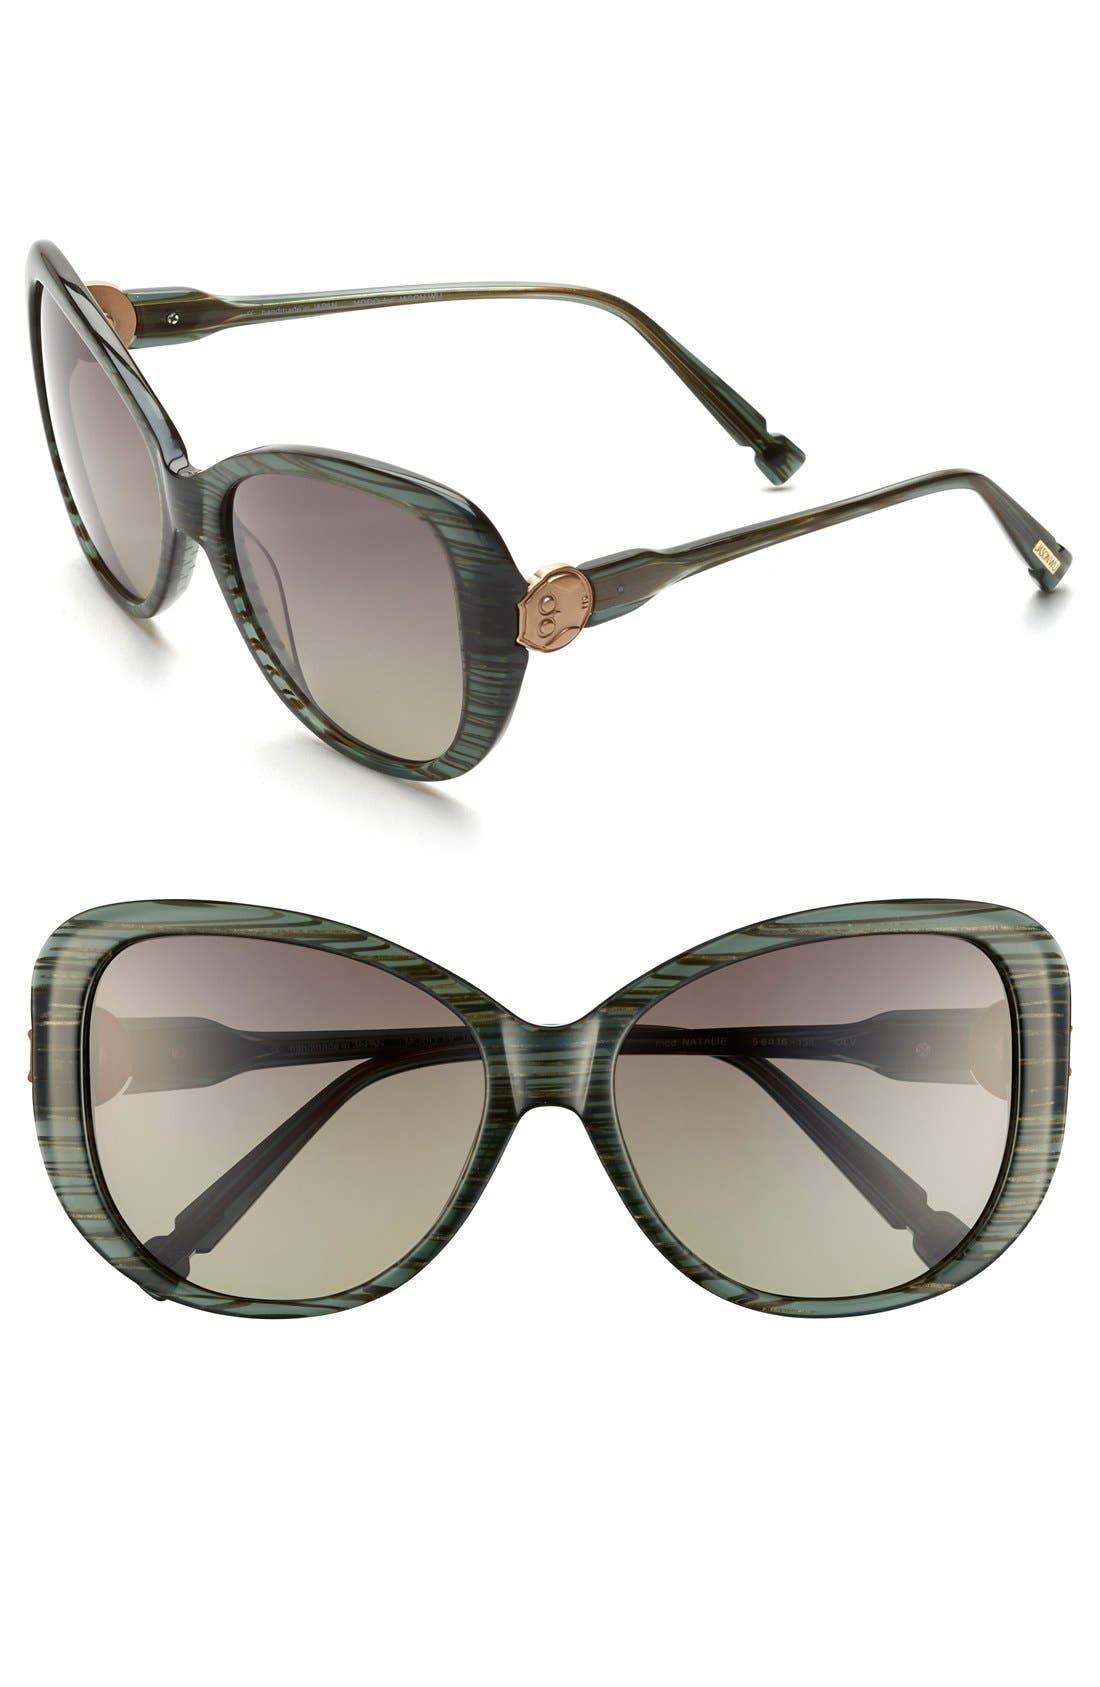 Alternate Image 1 Selected - Jason Wu 'Natalie' 56mm Sunglasses